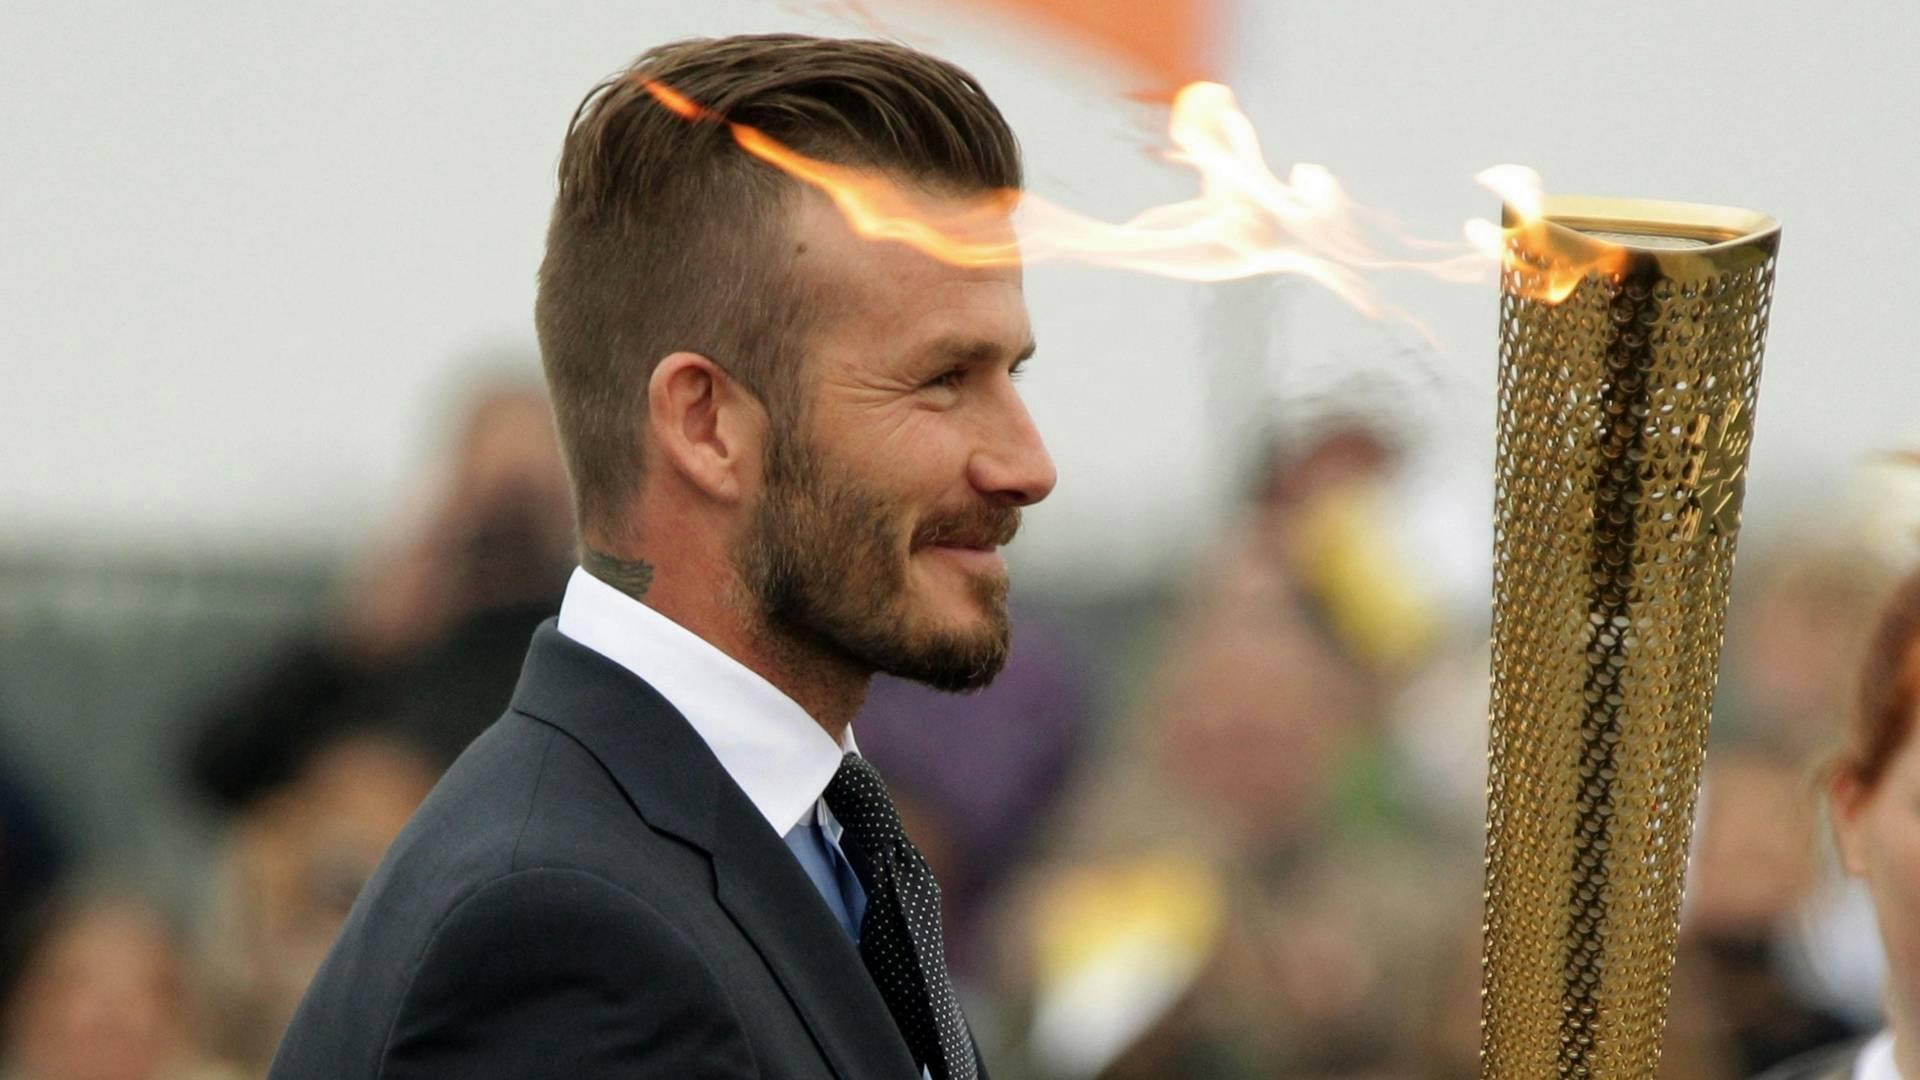 David Beckham Haircut 2013 Back David Beckham 2013 Hairstyle